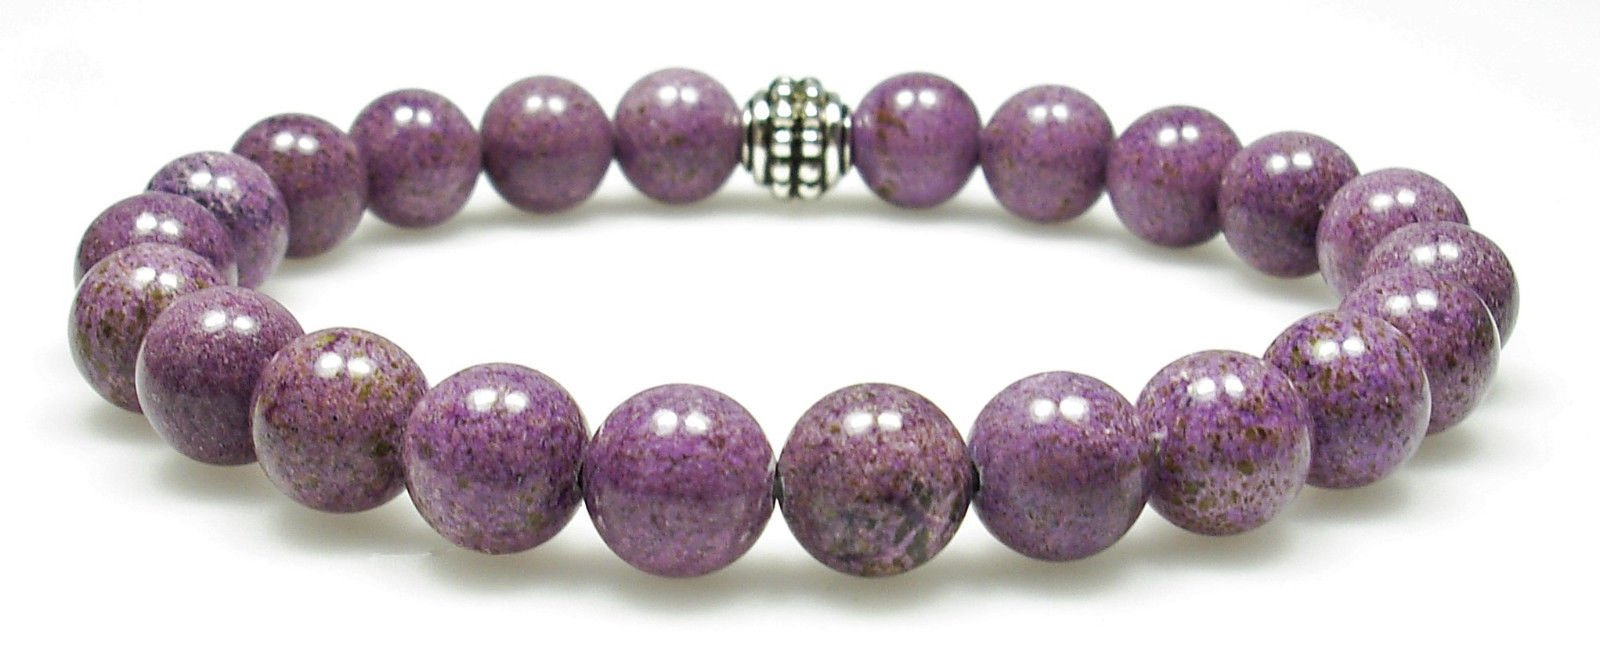 STICHTITE 8mm Round Genuine Crystal Gemstone Beaded Bracelet on Elastic Cord